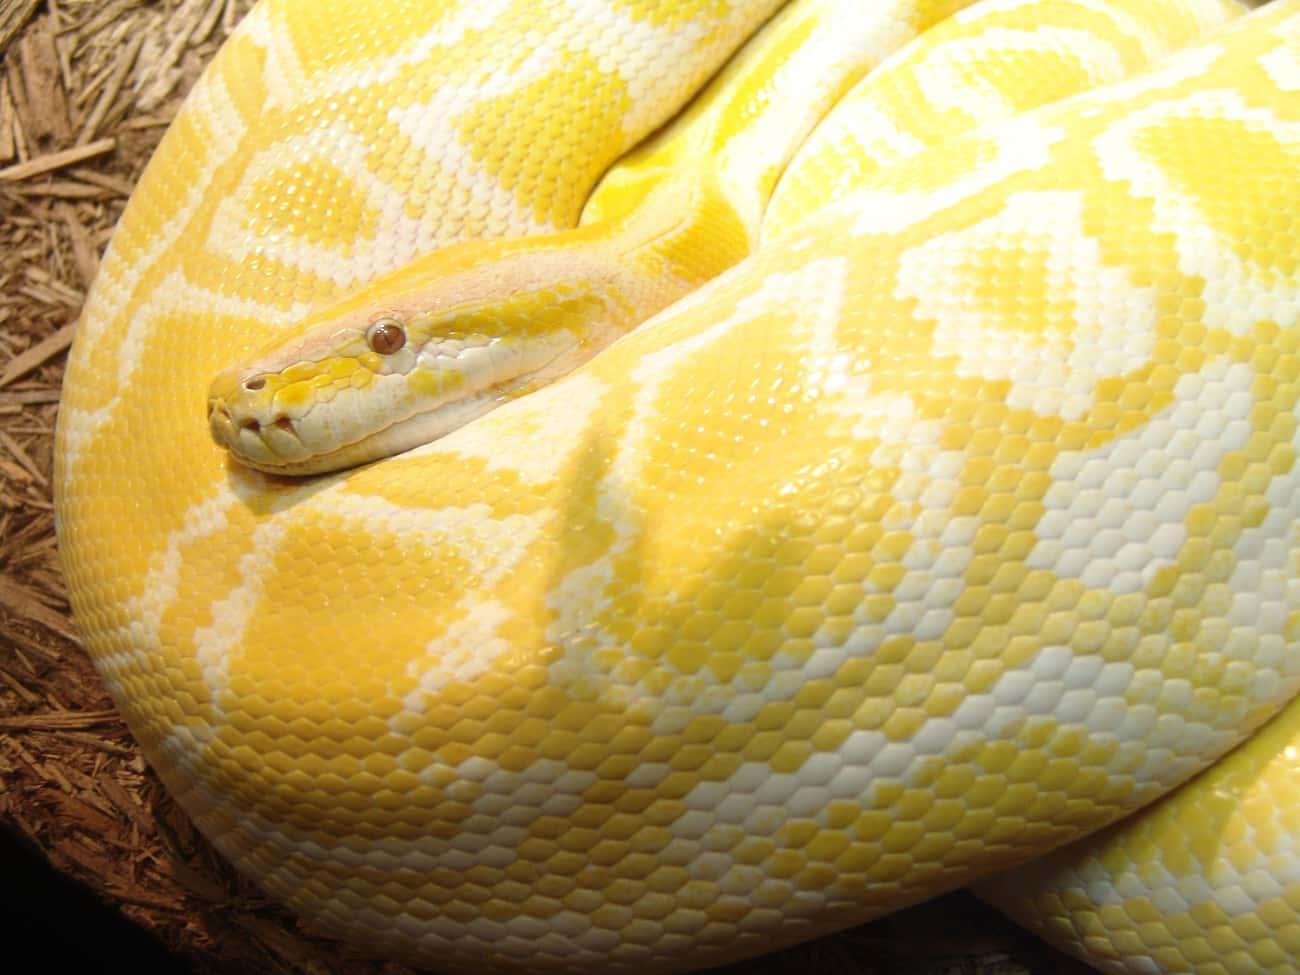 Gypsy The Burmese Python Strangled A Toddler